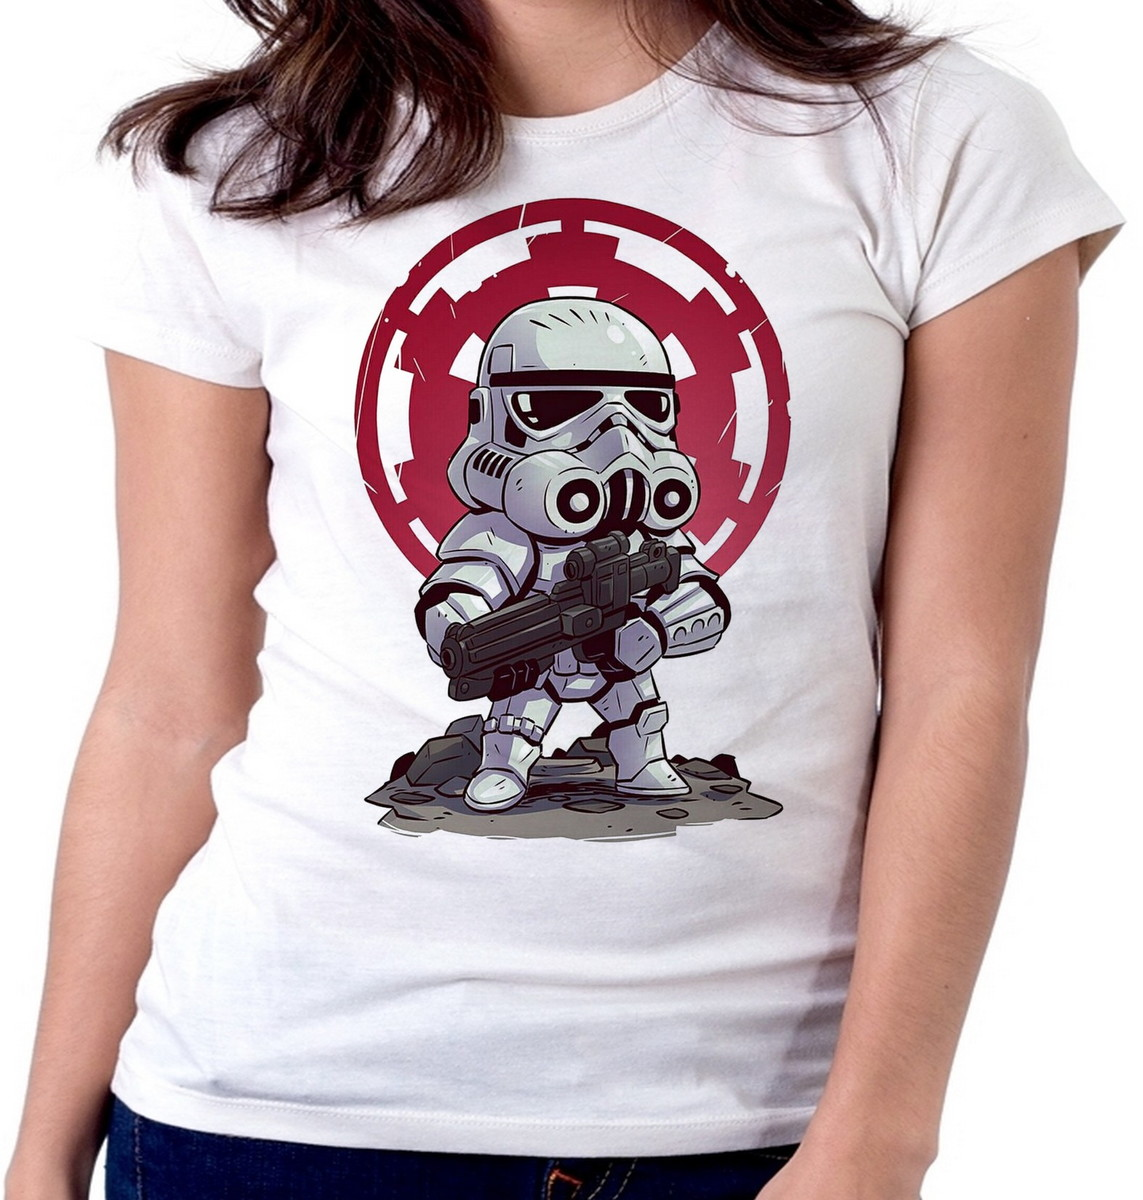 91e847346 Blusa feminina baby look camiseta Storm trooper star wars no Elo7 ...